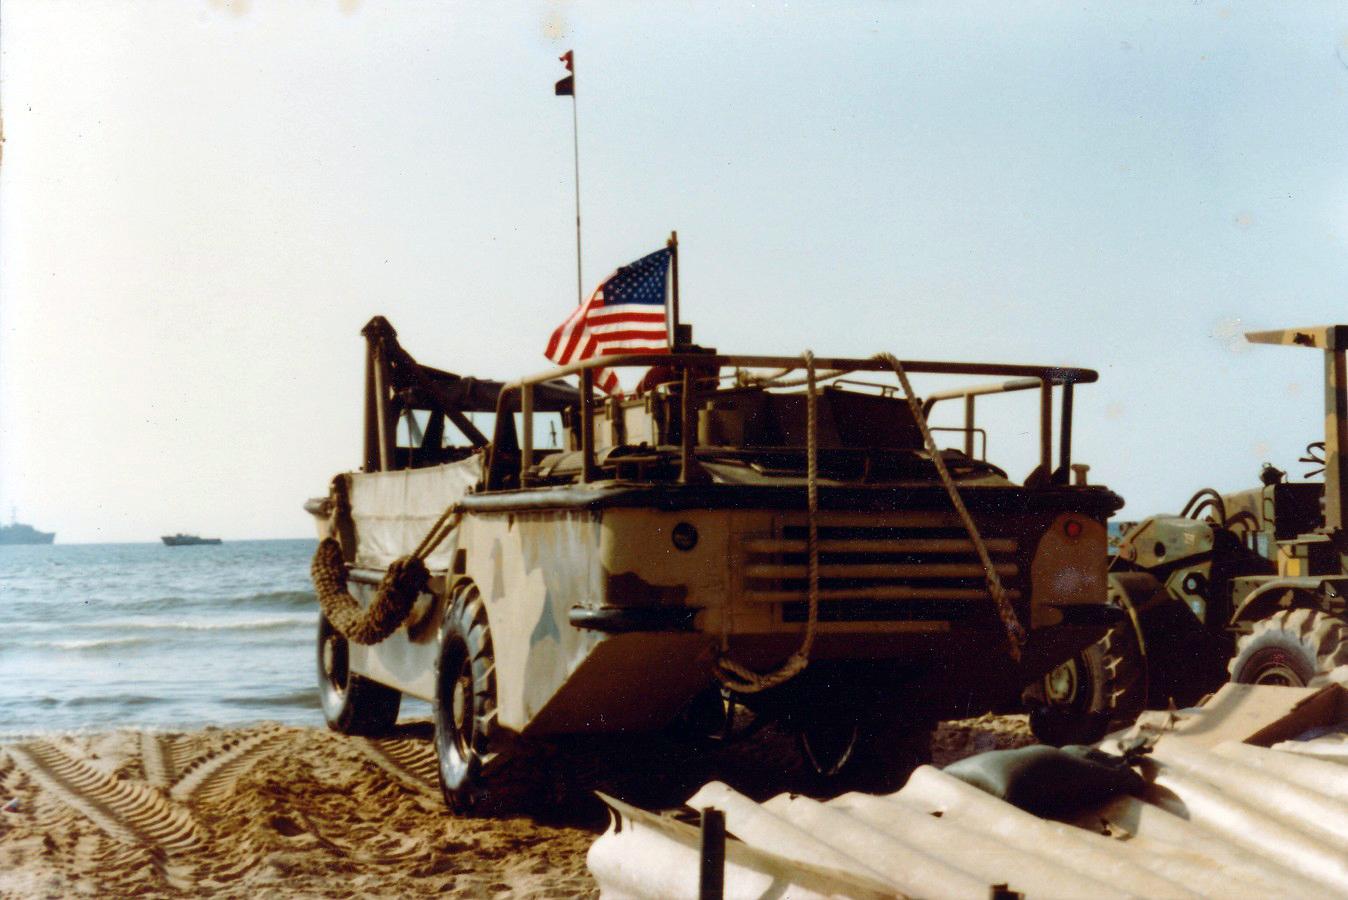 File:Navy Amphibian, Beirut 1982.jpg